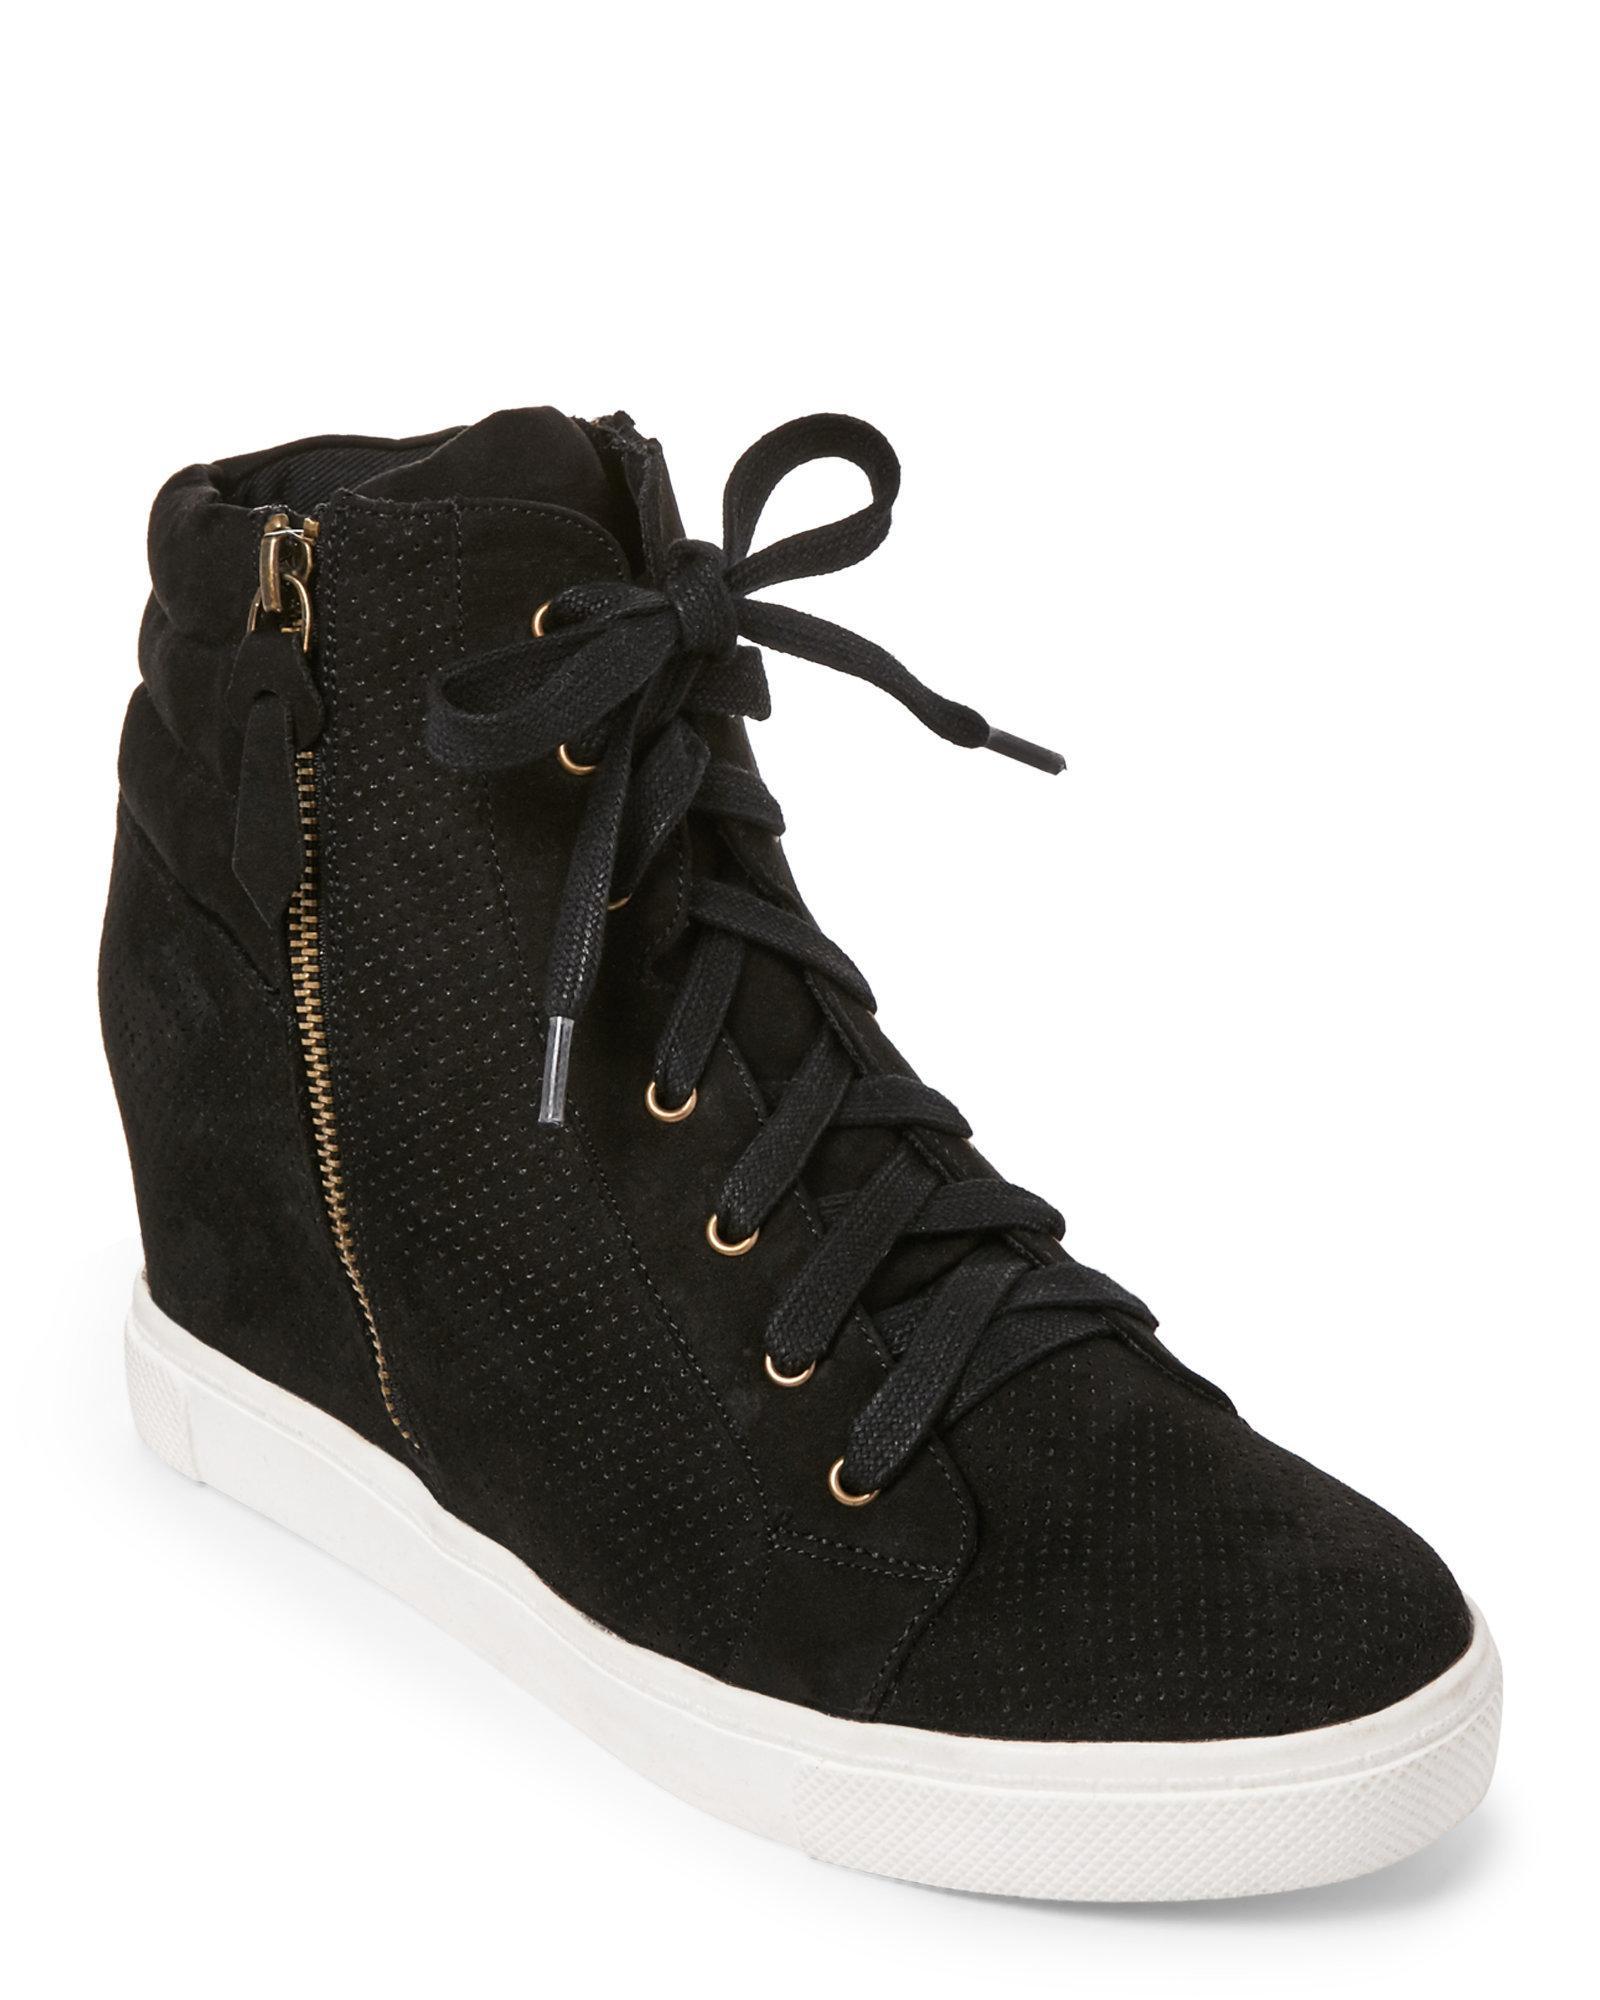 Lyst Steve Madden Black Llynn Perforated Wedge Sneakers